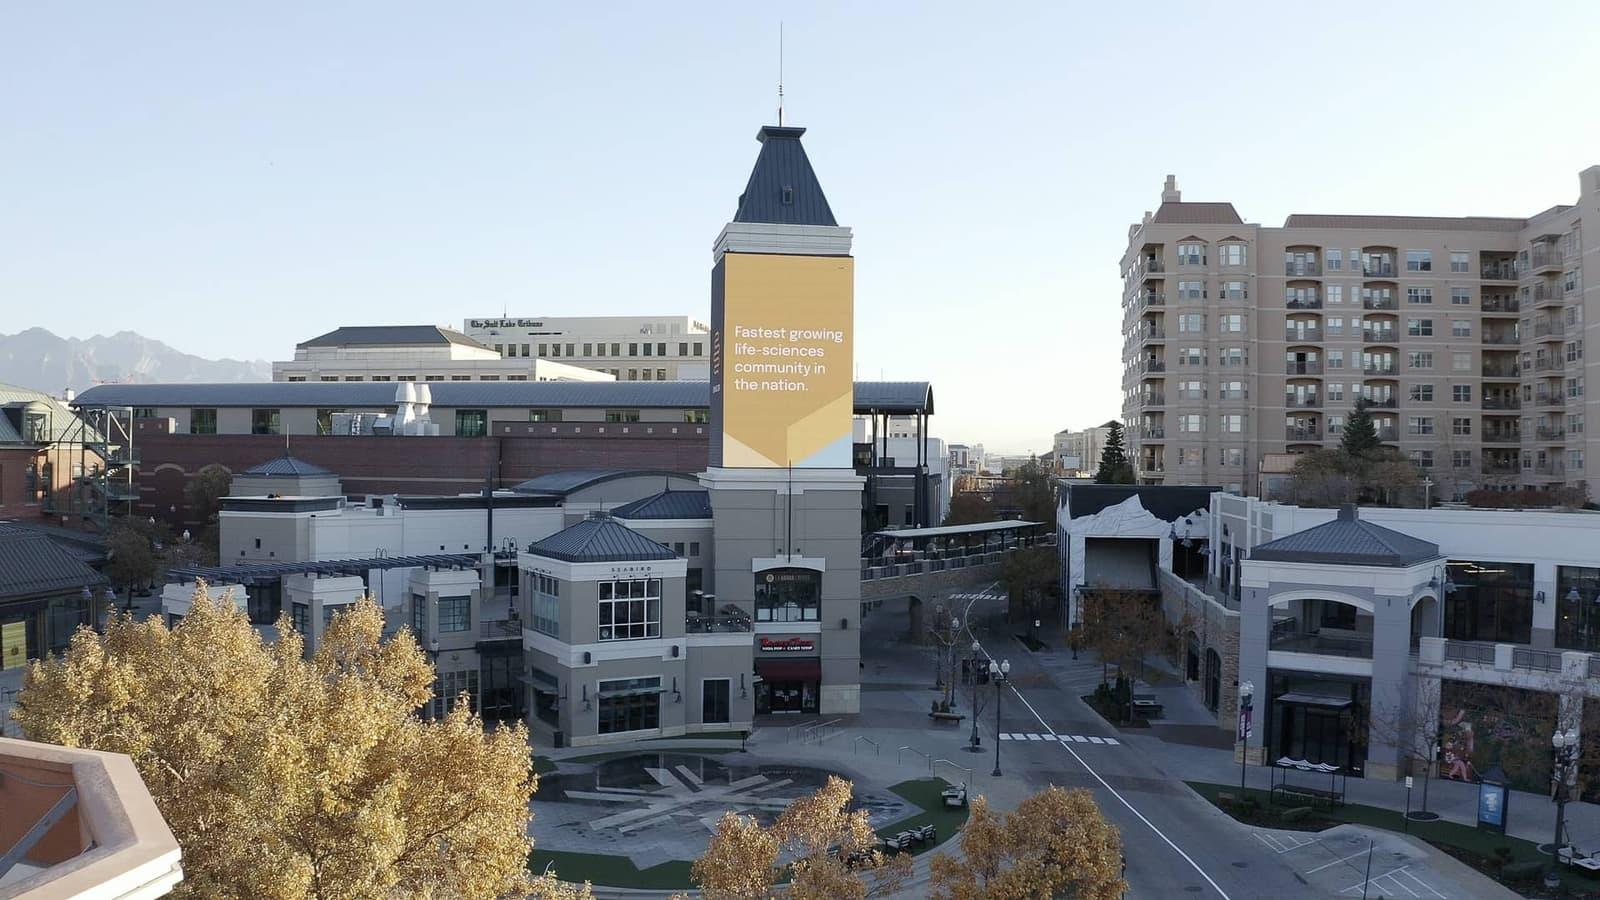 The Gateway, a hub for Biotech